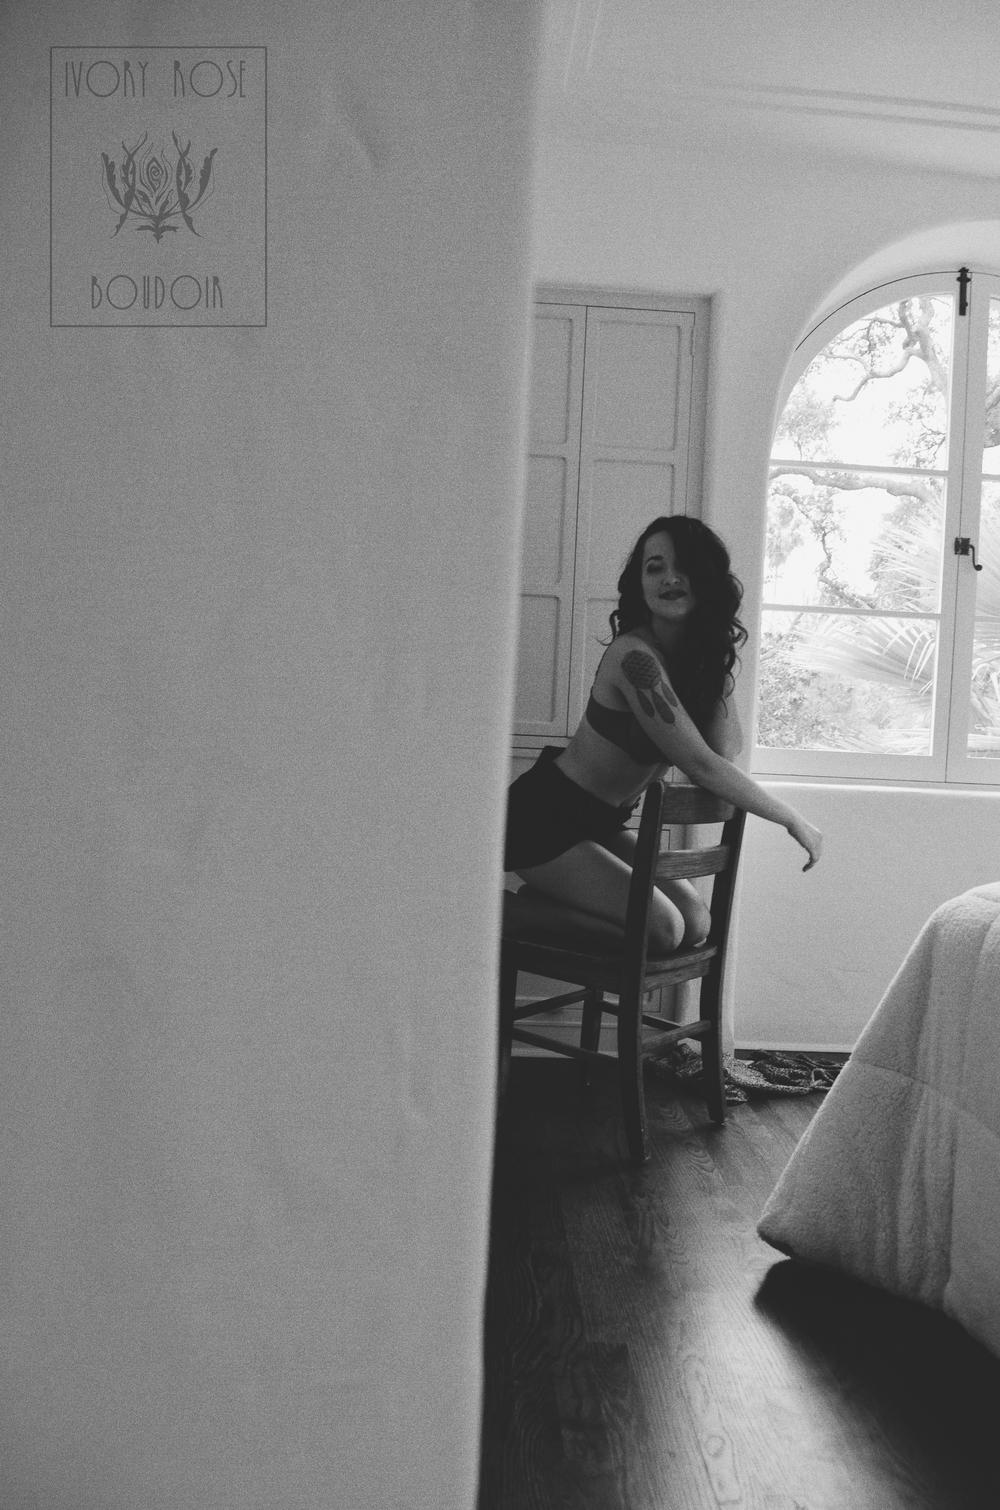 Ivory Rose Boudoir - Elisabeth 2015 vintage bride fine art photography ojai santa barbara los angeles california goddess -14.jpg